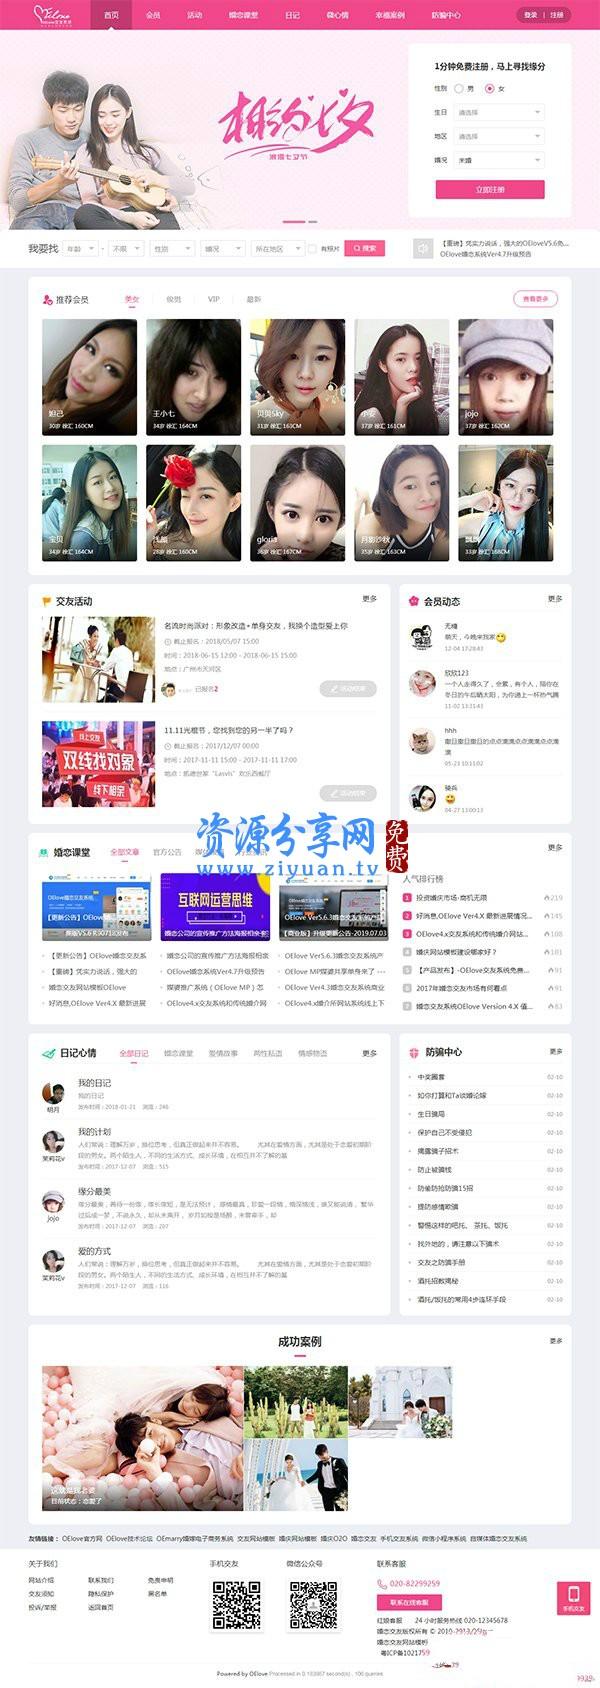 OElove 微信交友网站源码 v5.6